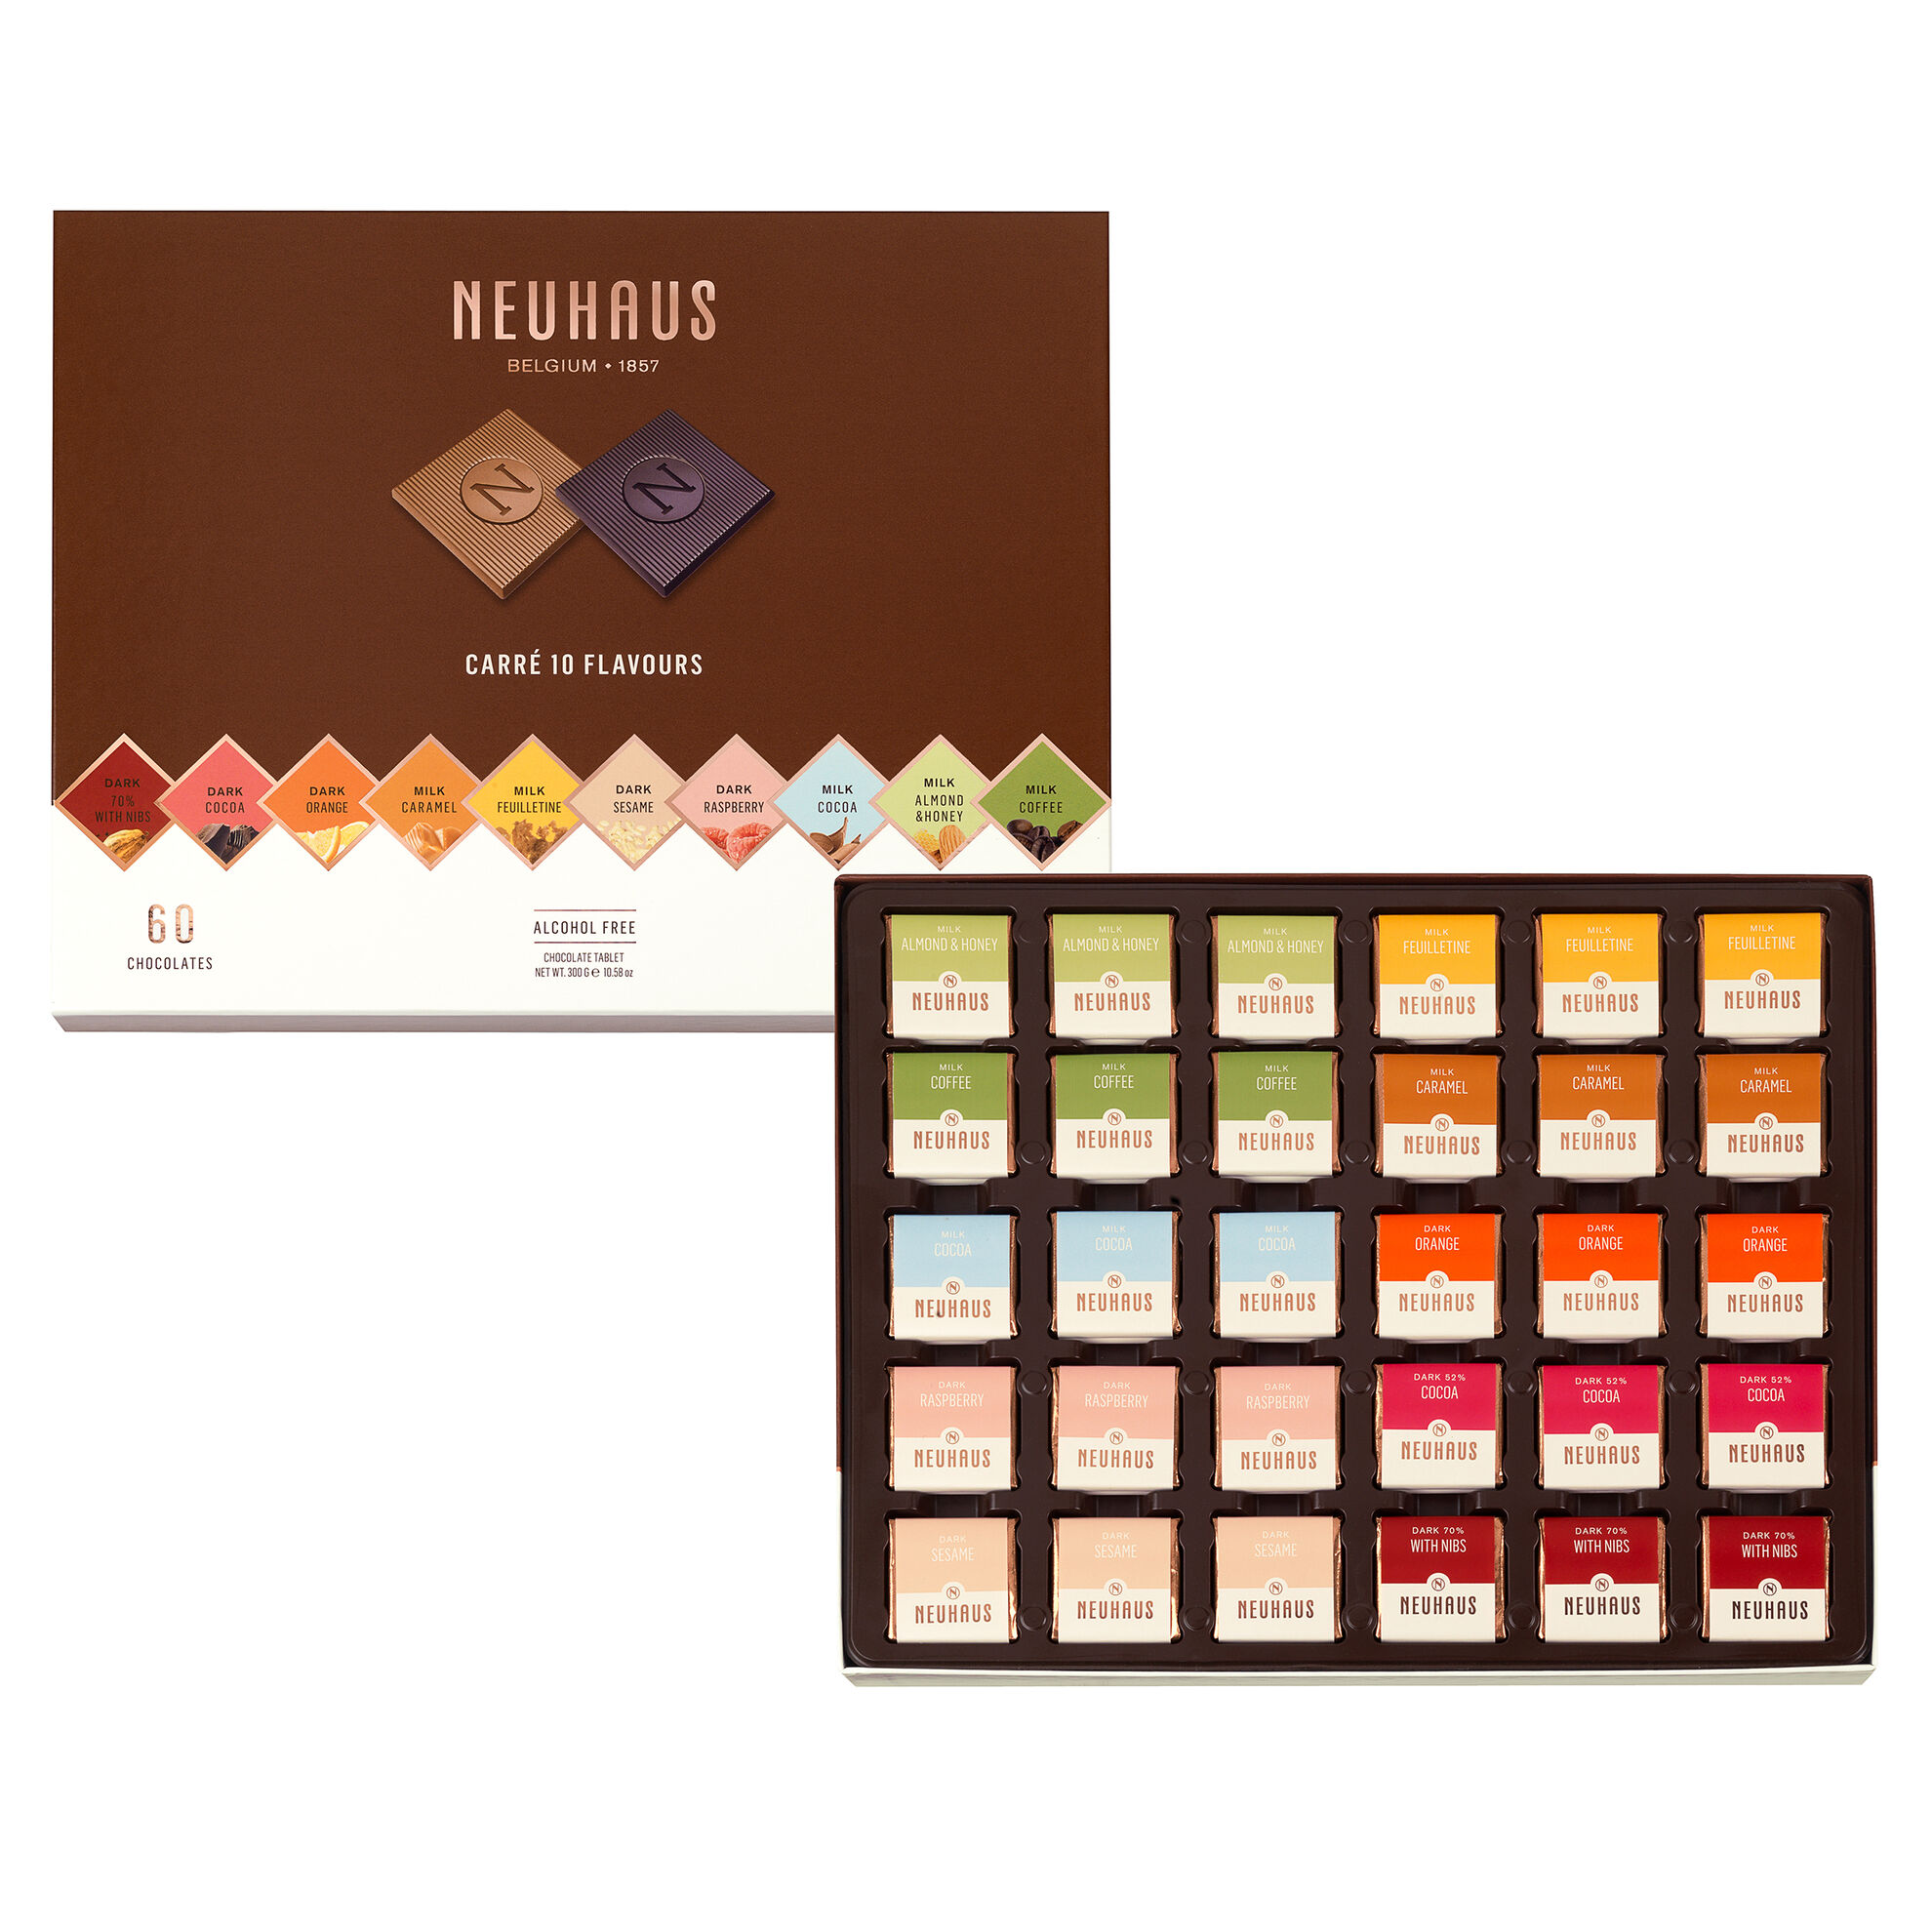 Belgian Chocolate Squares - Carré 10 Flavors 60 pcs image number 01